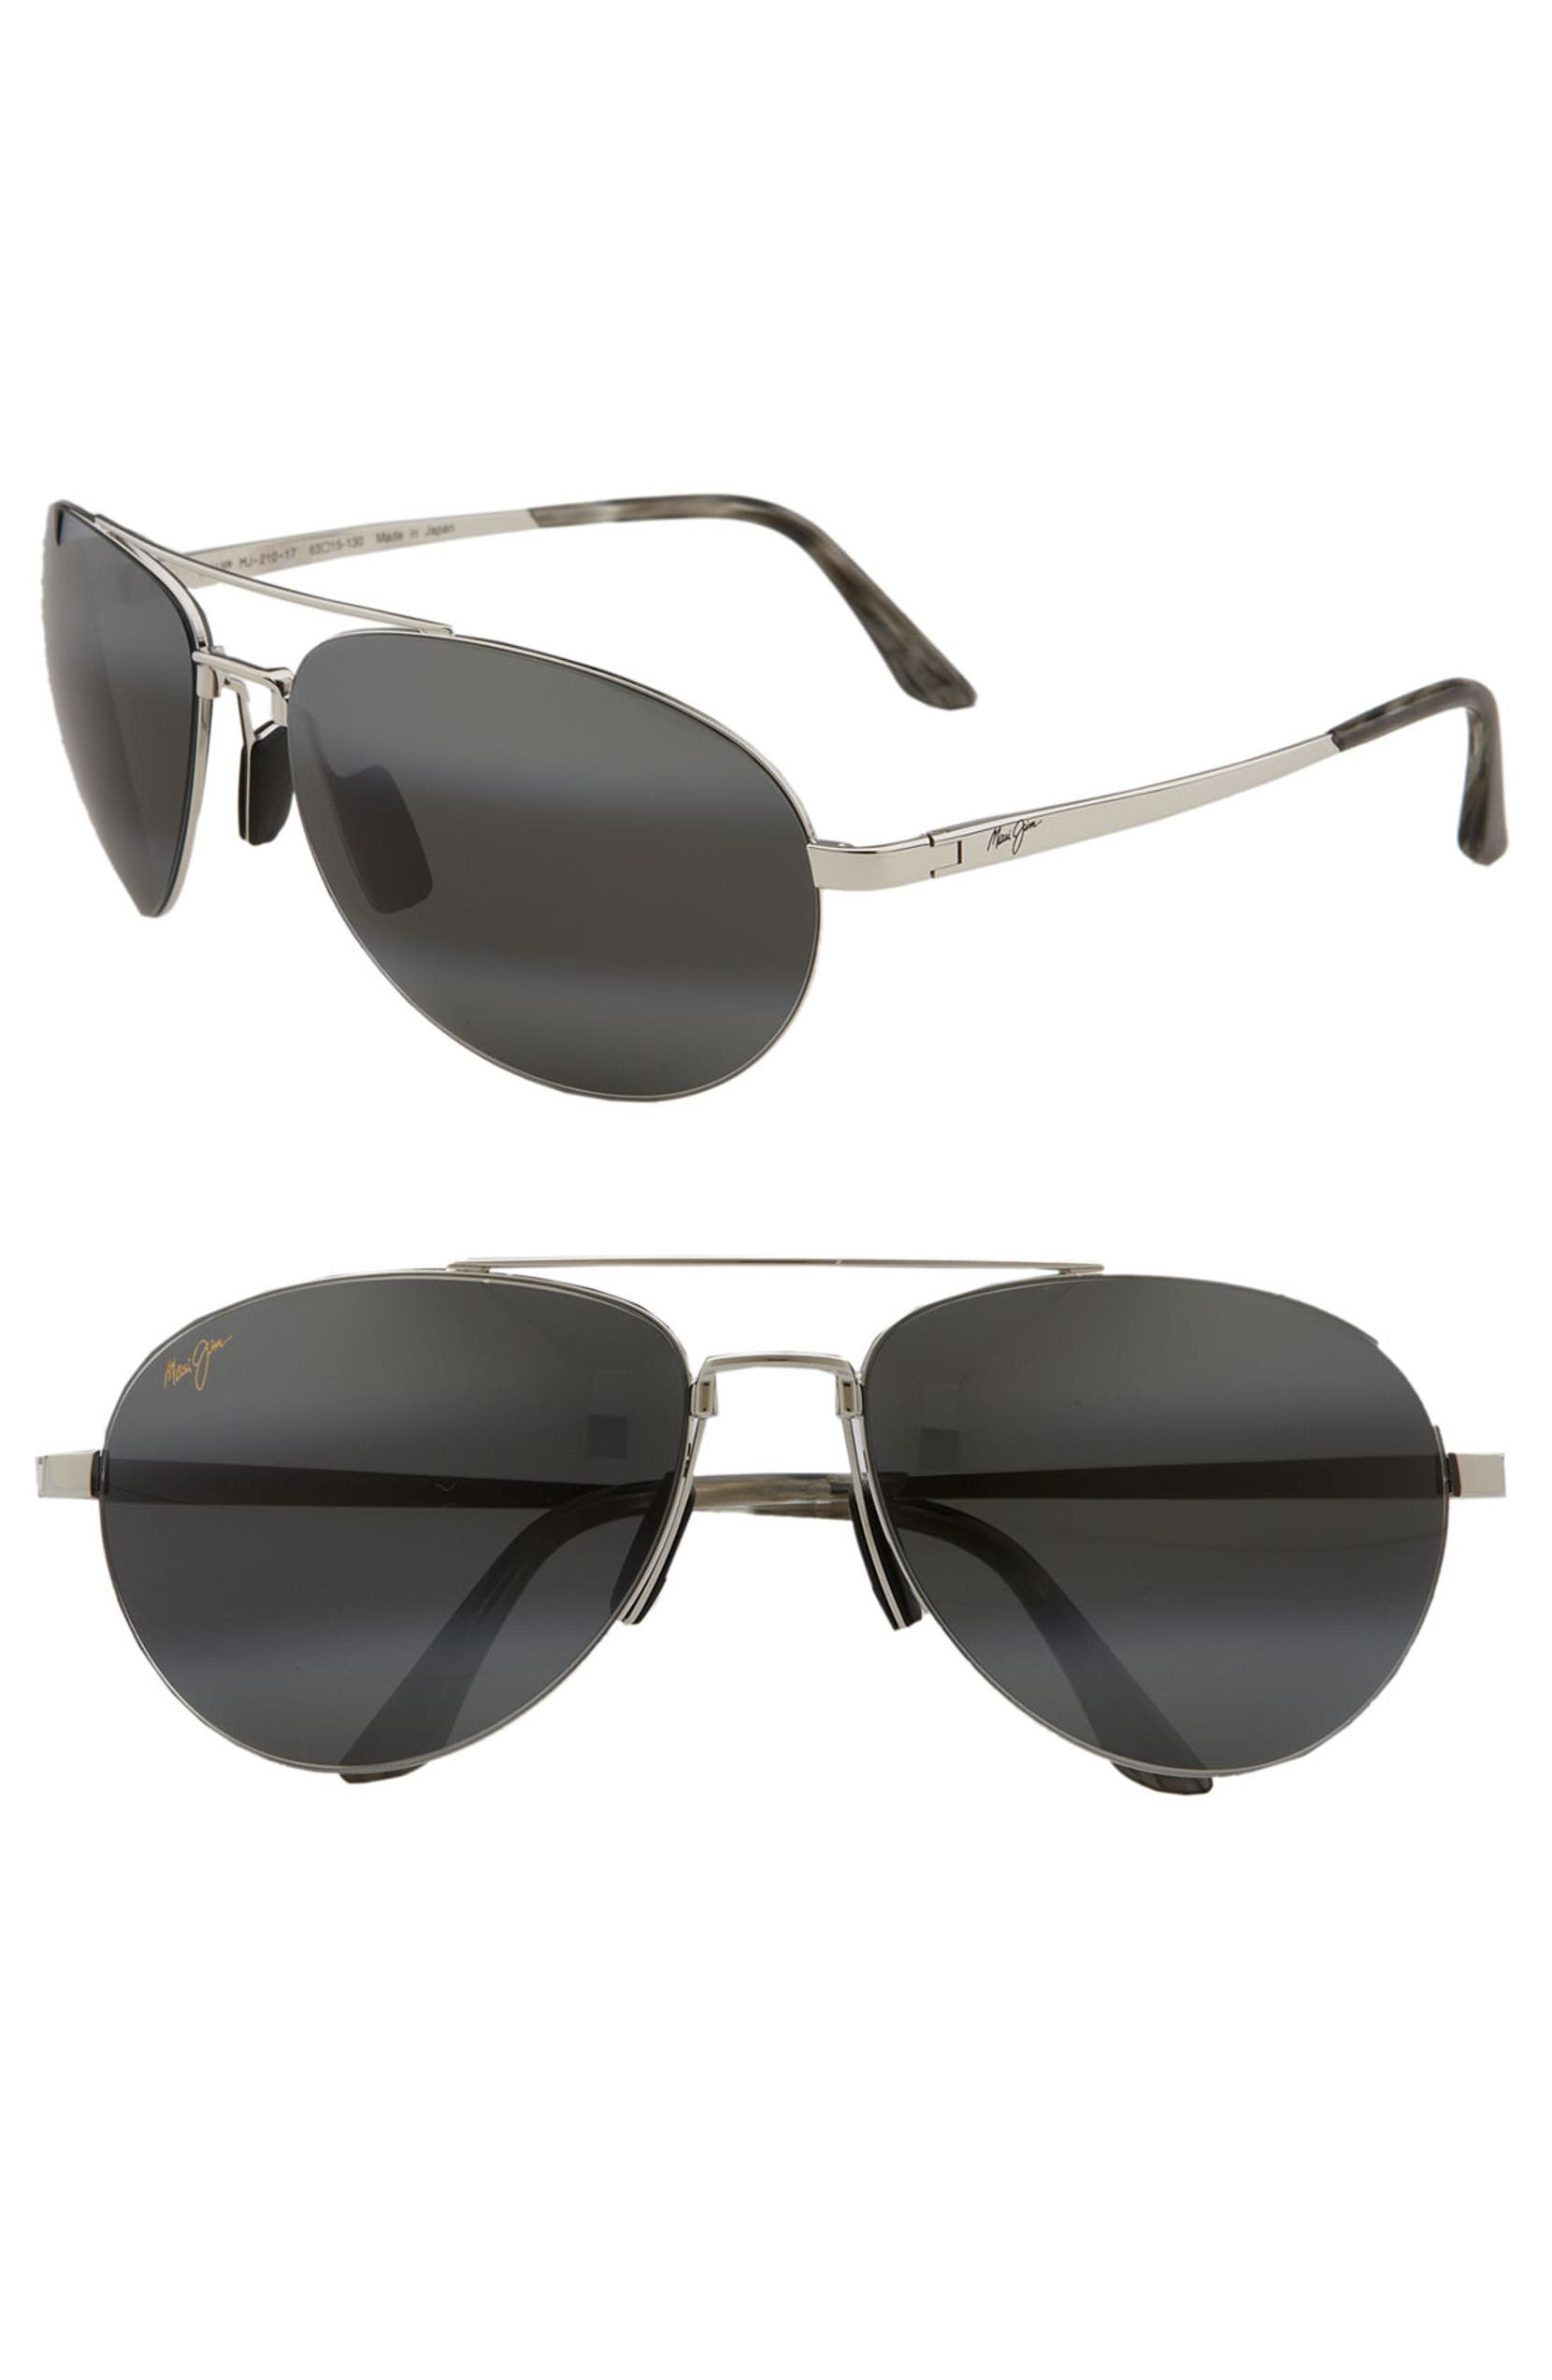 943ad1b6d4f Maui Jim  Pilot - PolarizedPlus®2  63mm Sunglasses